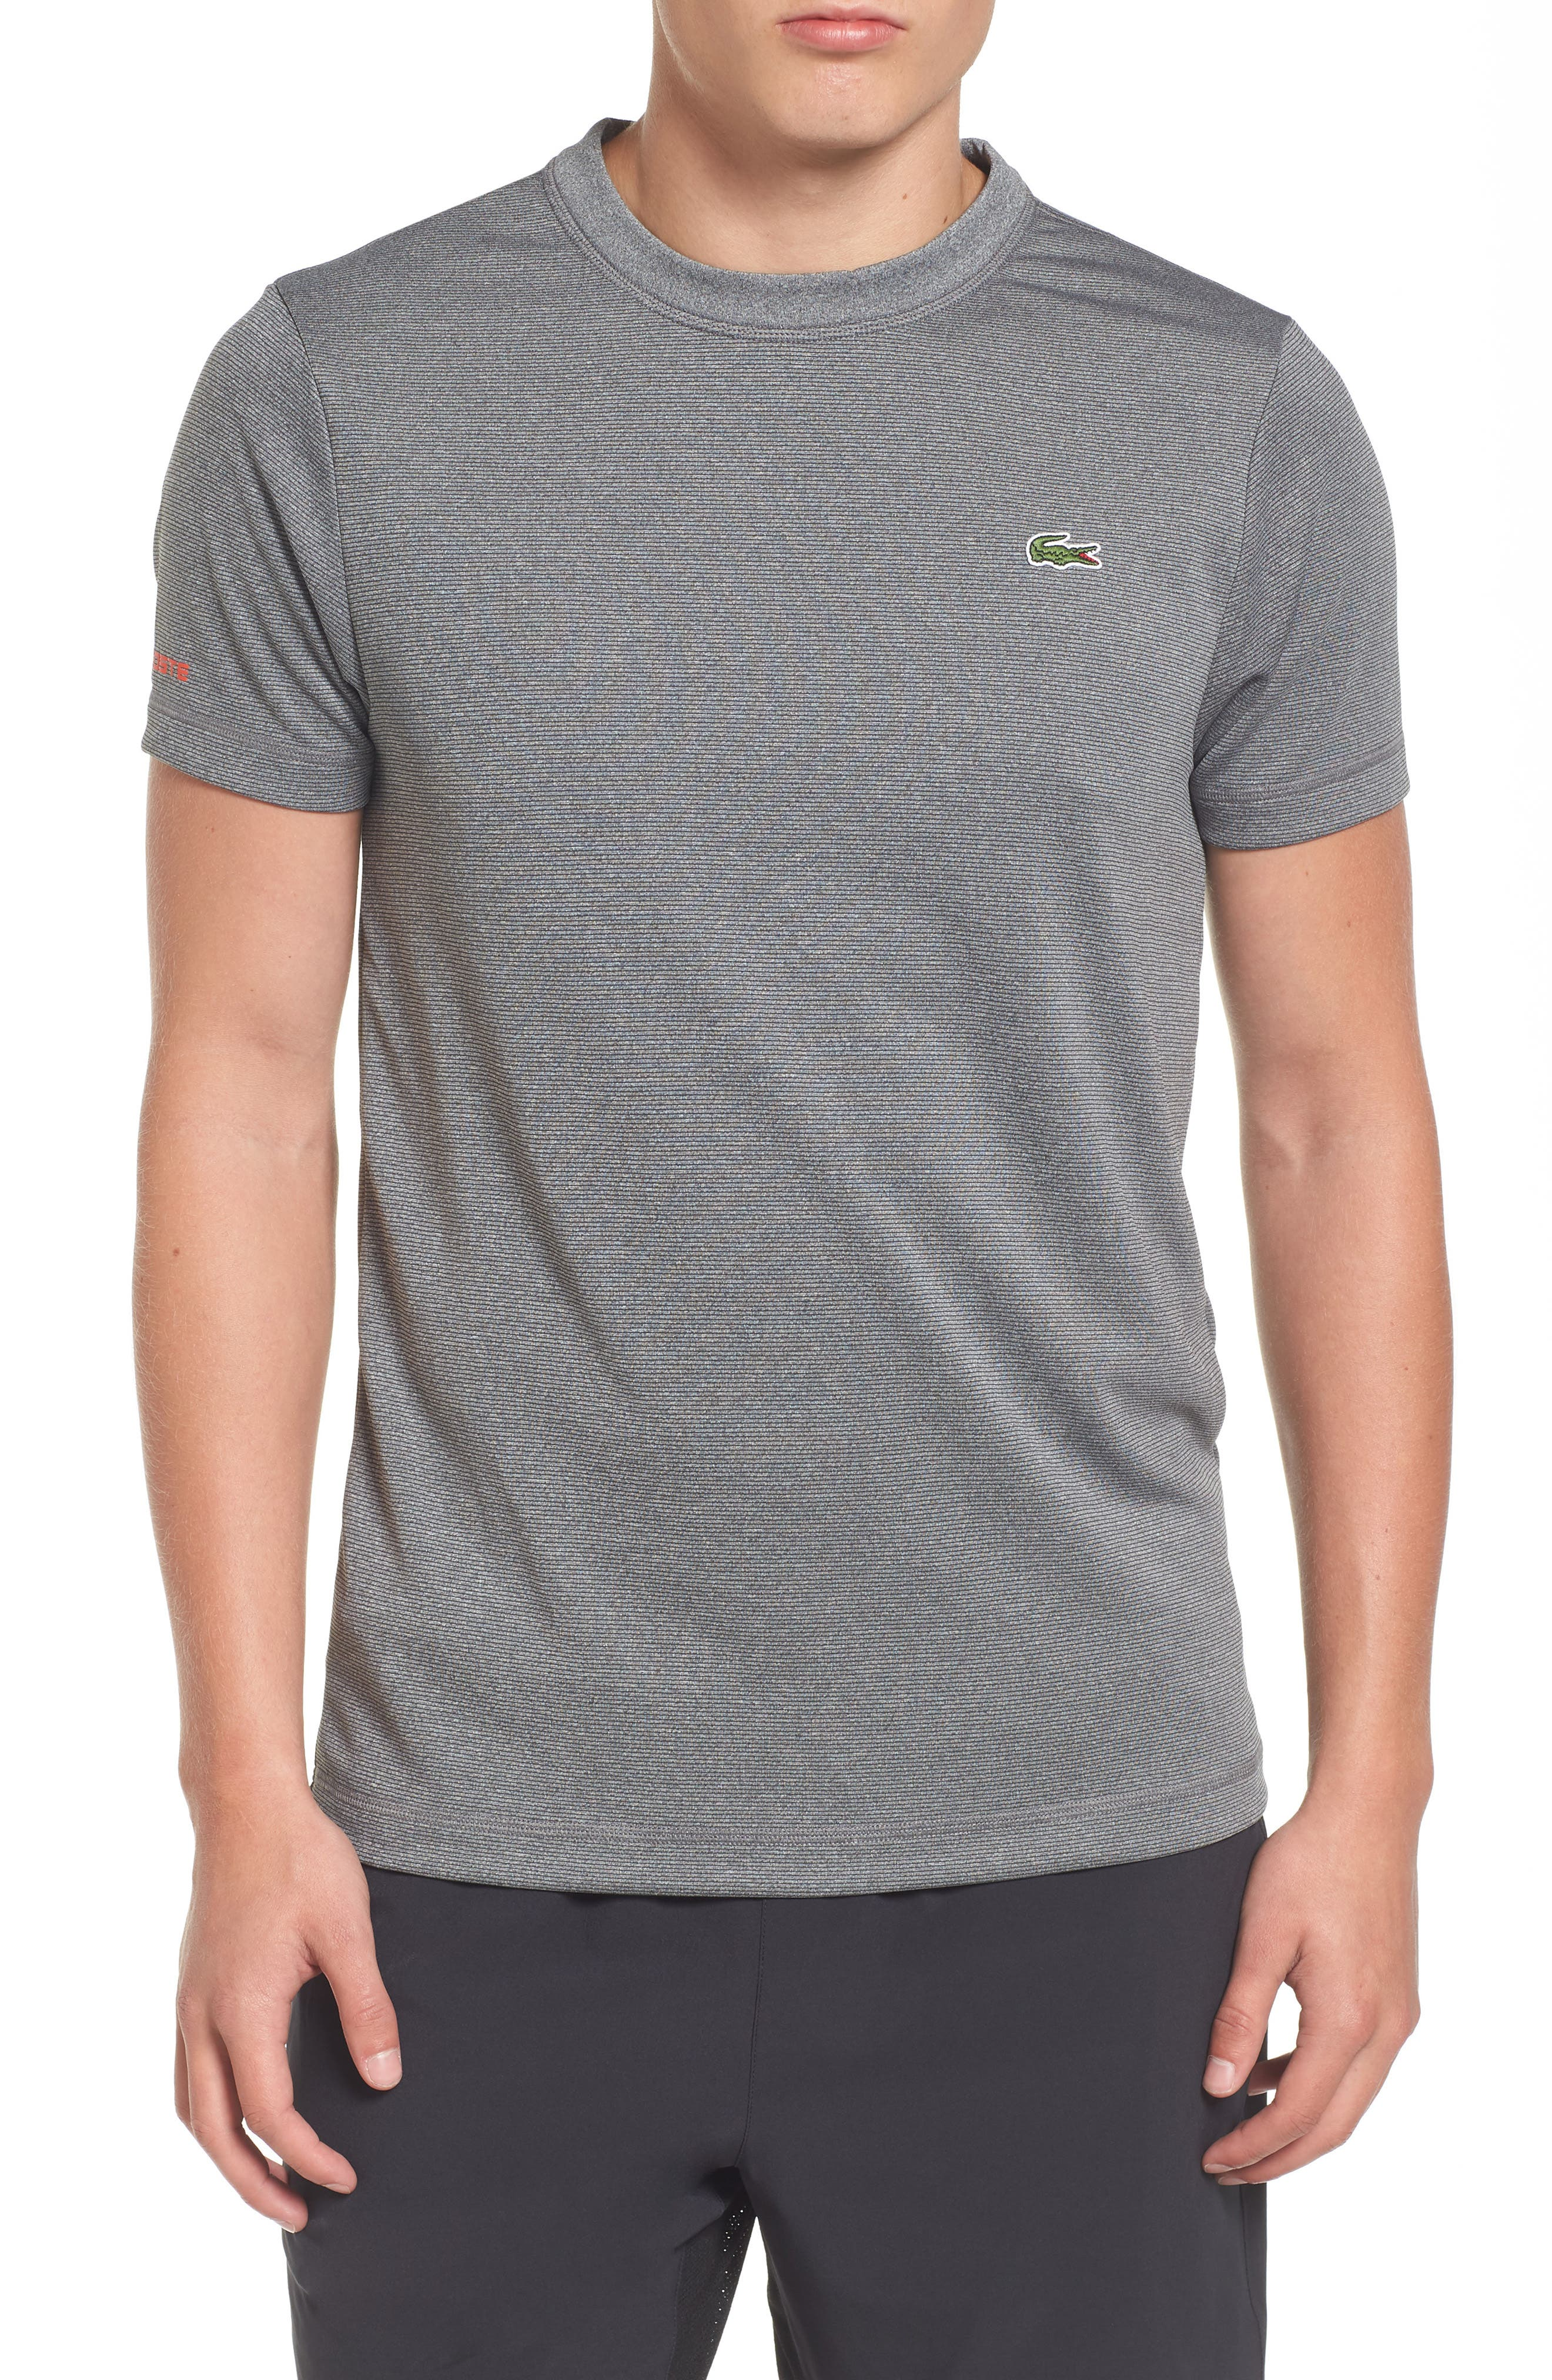 Lacoste Pinstripe Grommet T-Shirt